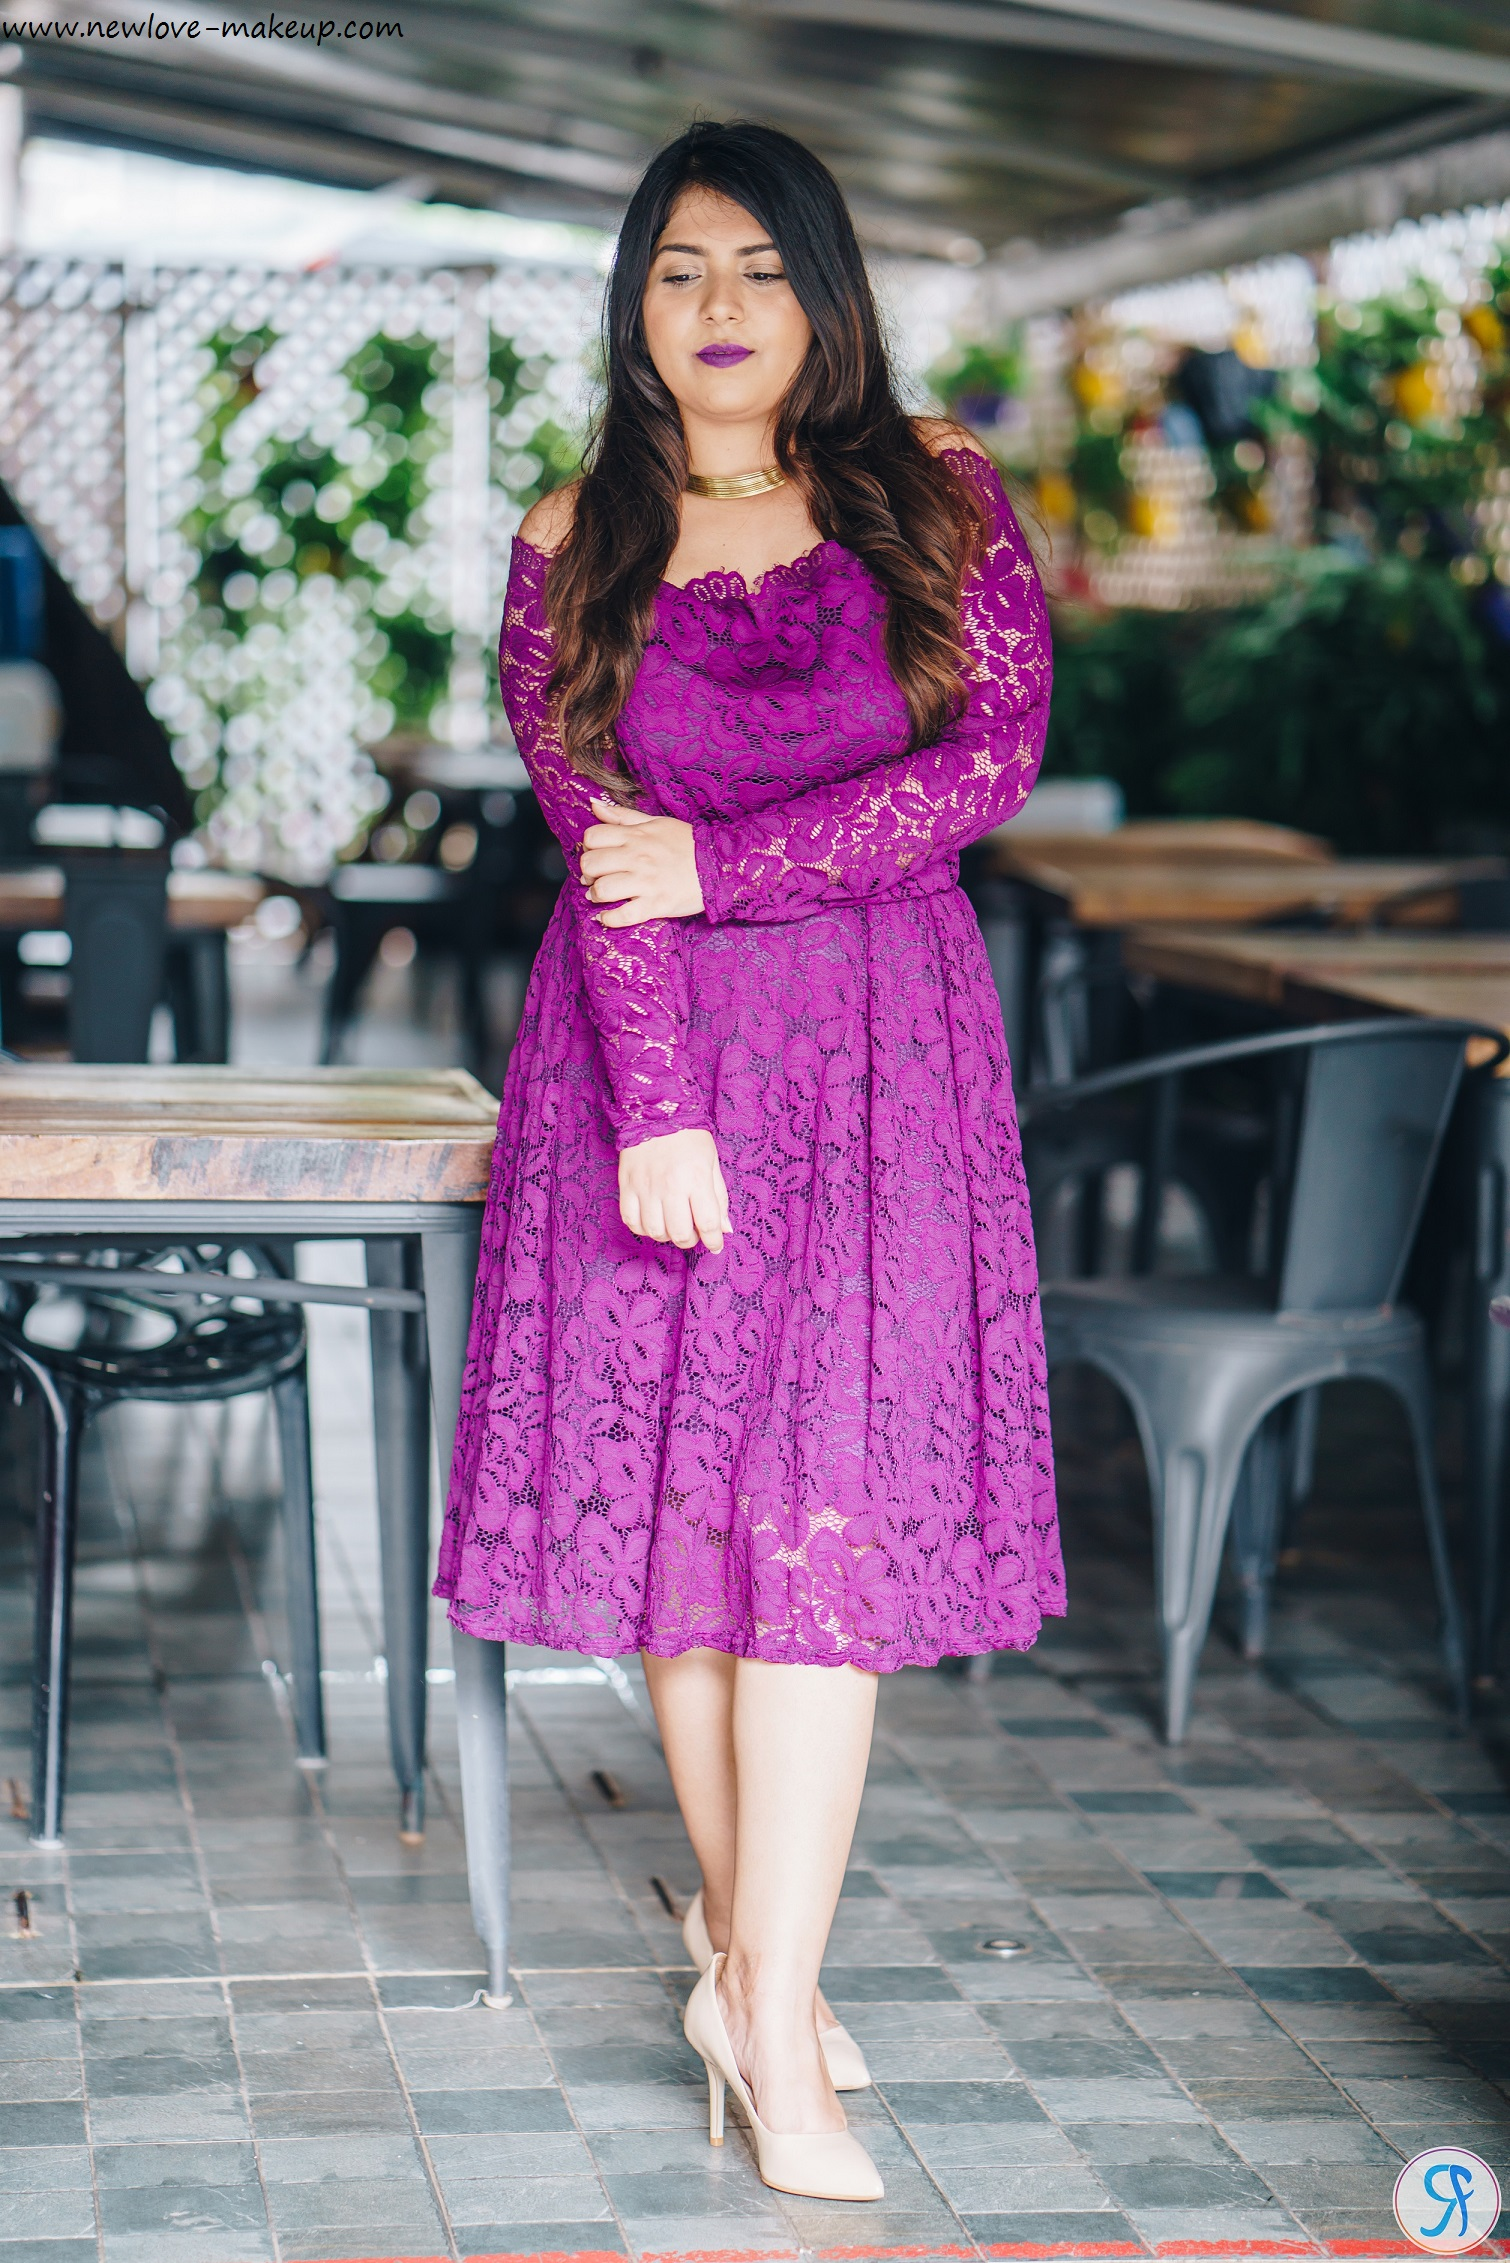 OOTD: Off Shoulder Purple Lace Dress